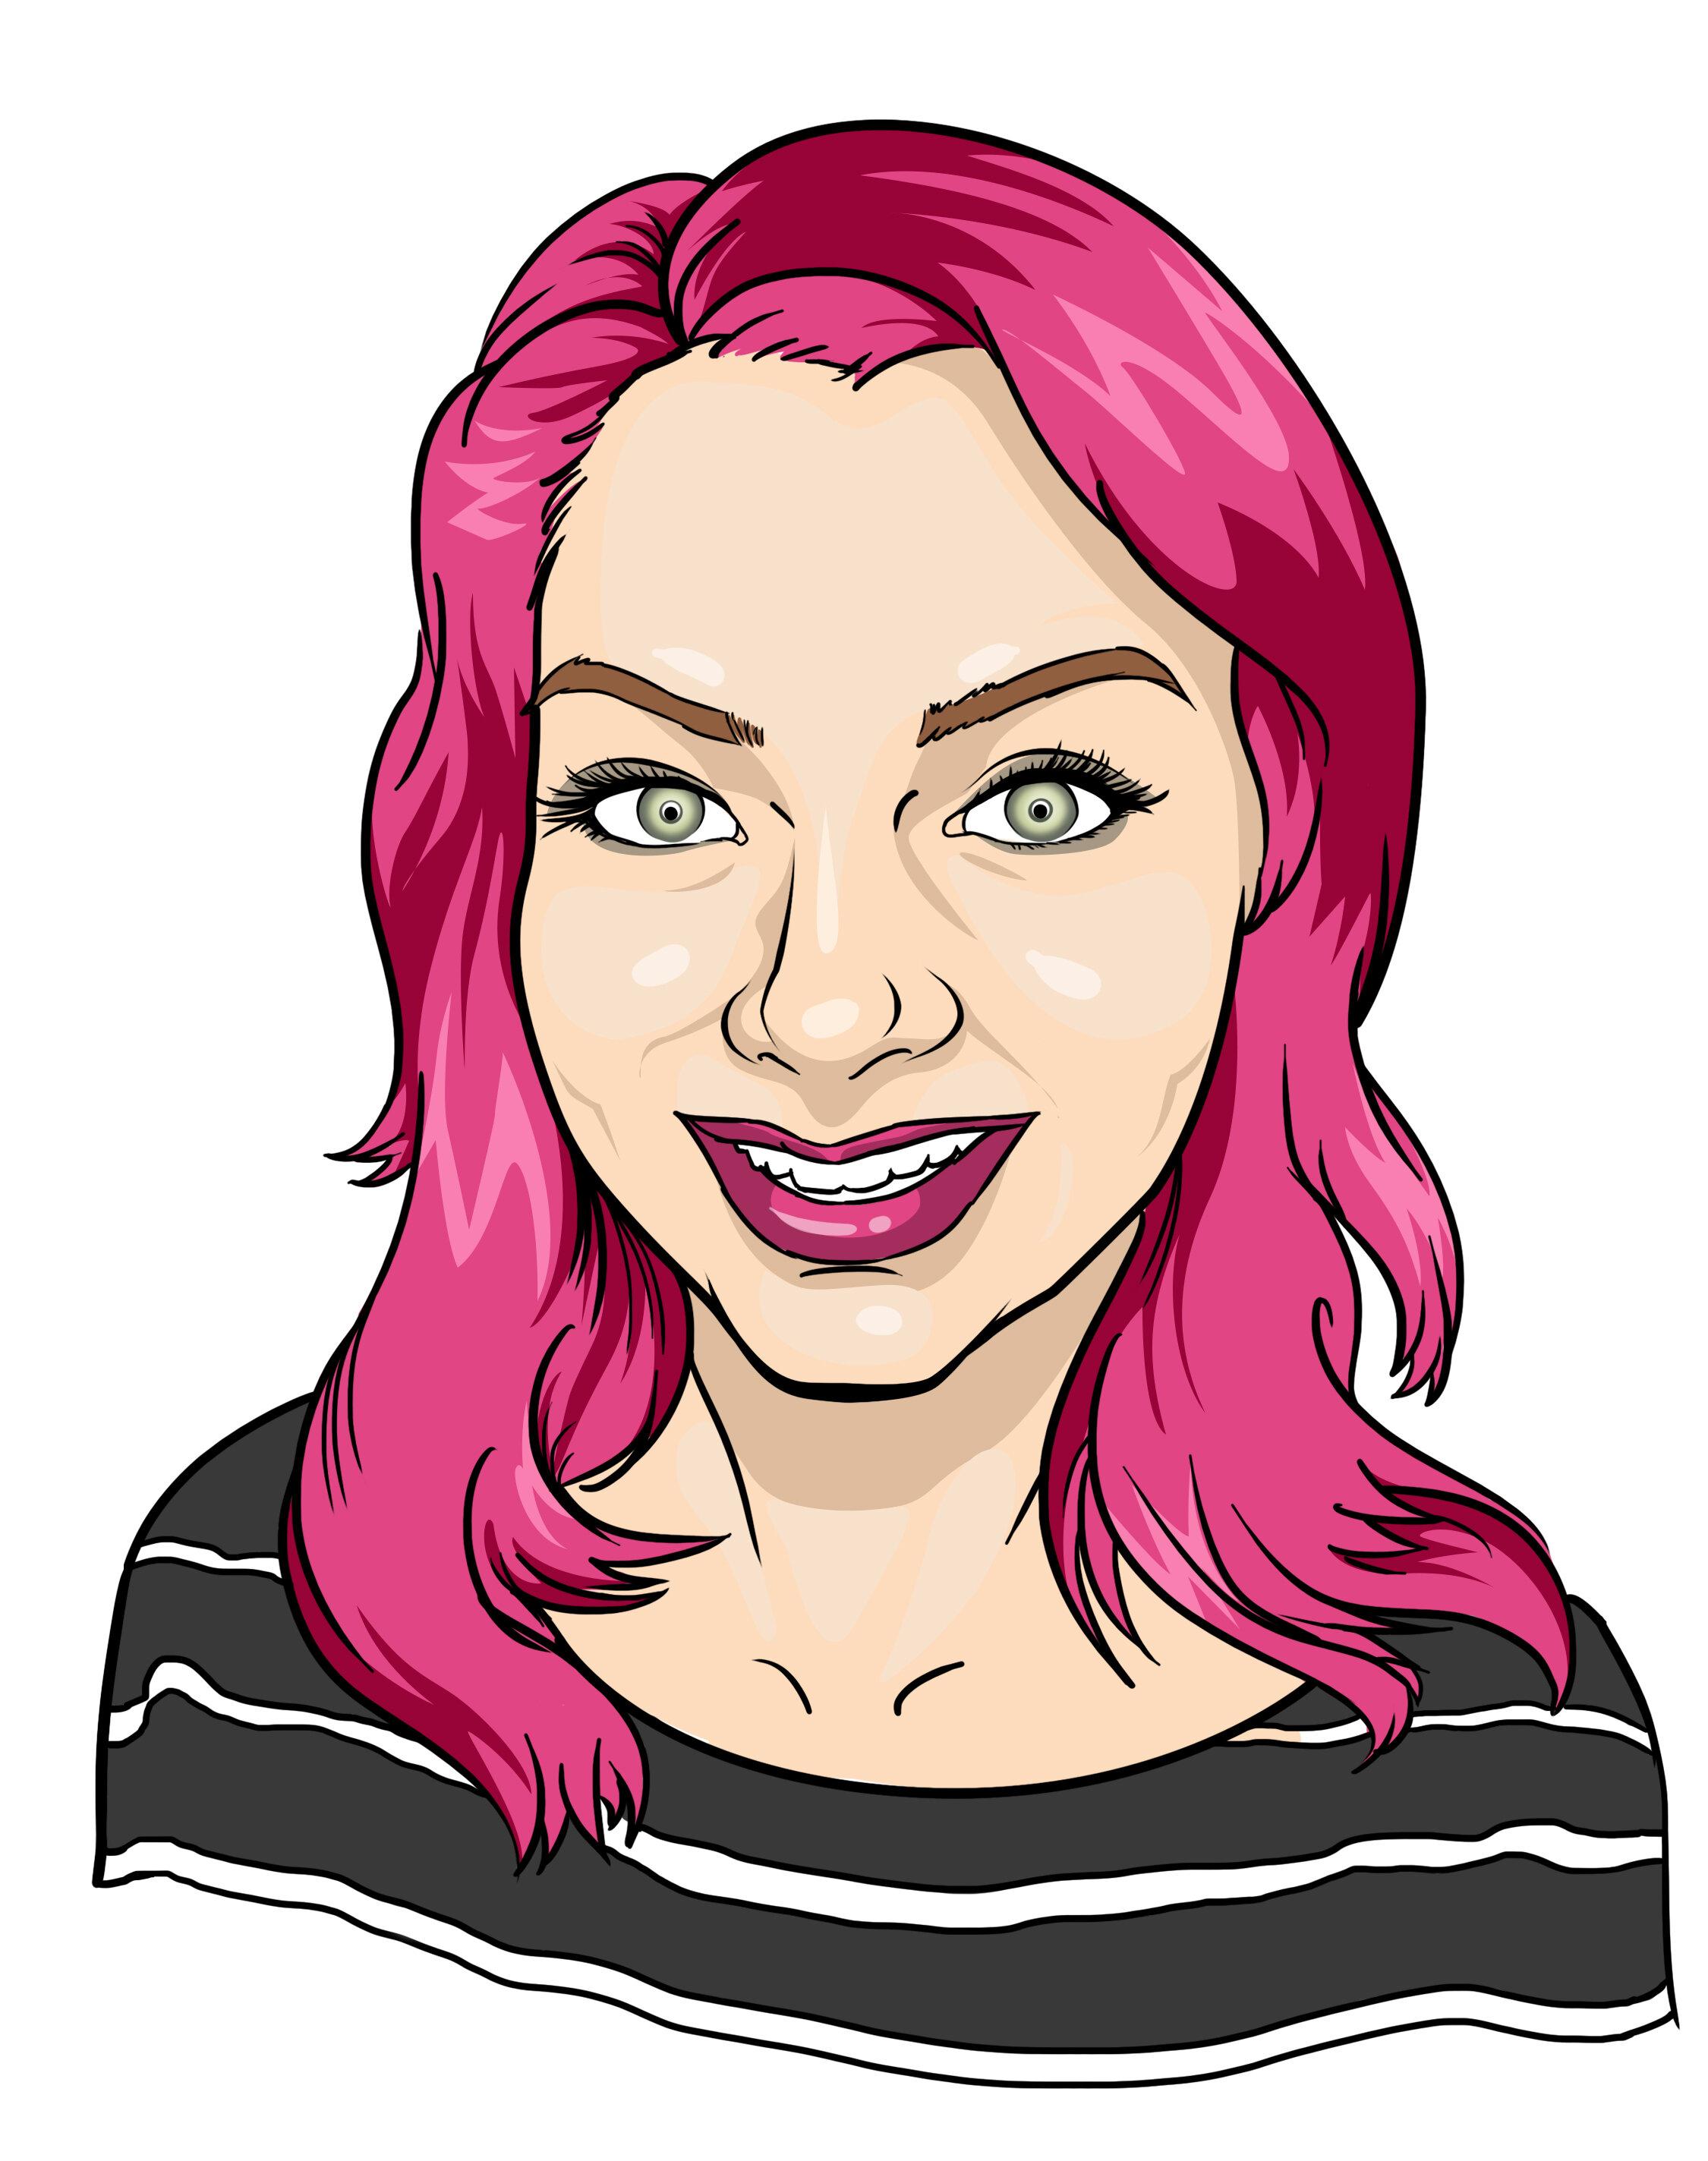 Shelby_portrait.jpg